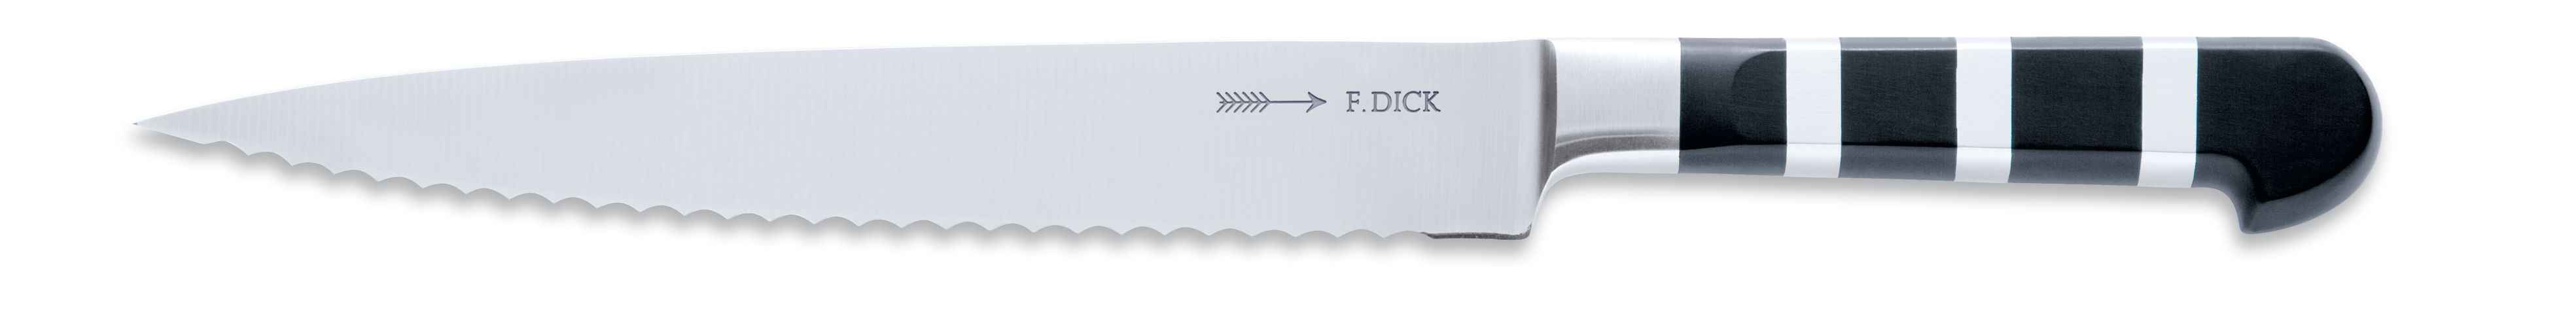 F.Dick Steakový nůž s vlnitým výbrusem ze série 1905, 12cm